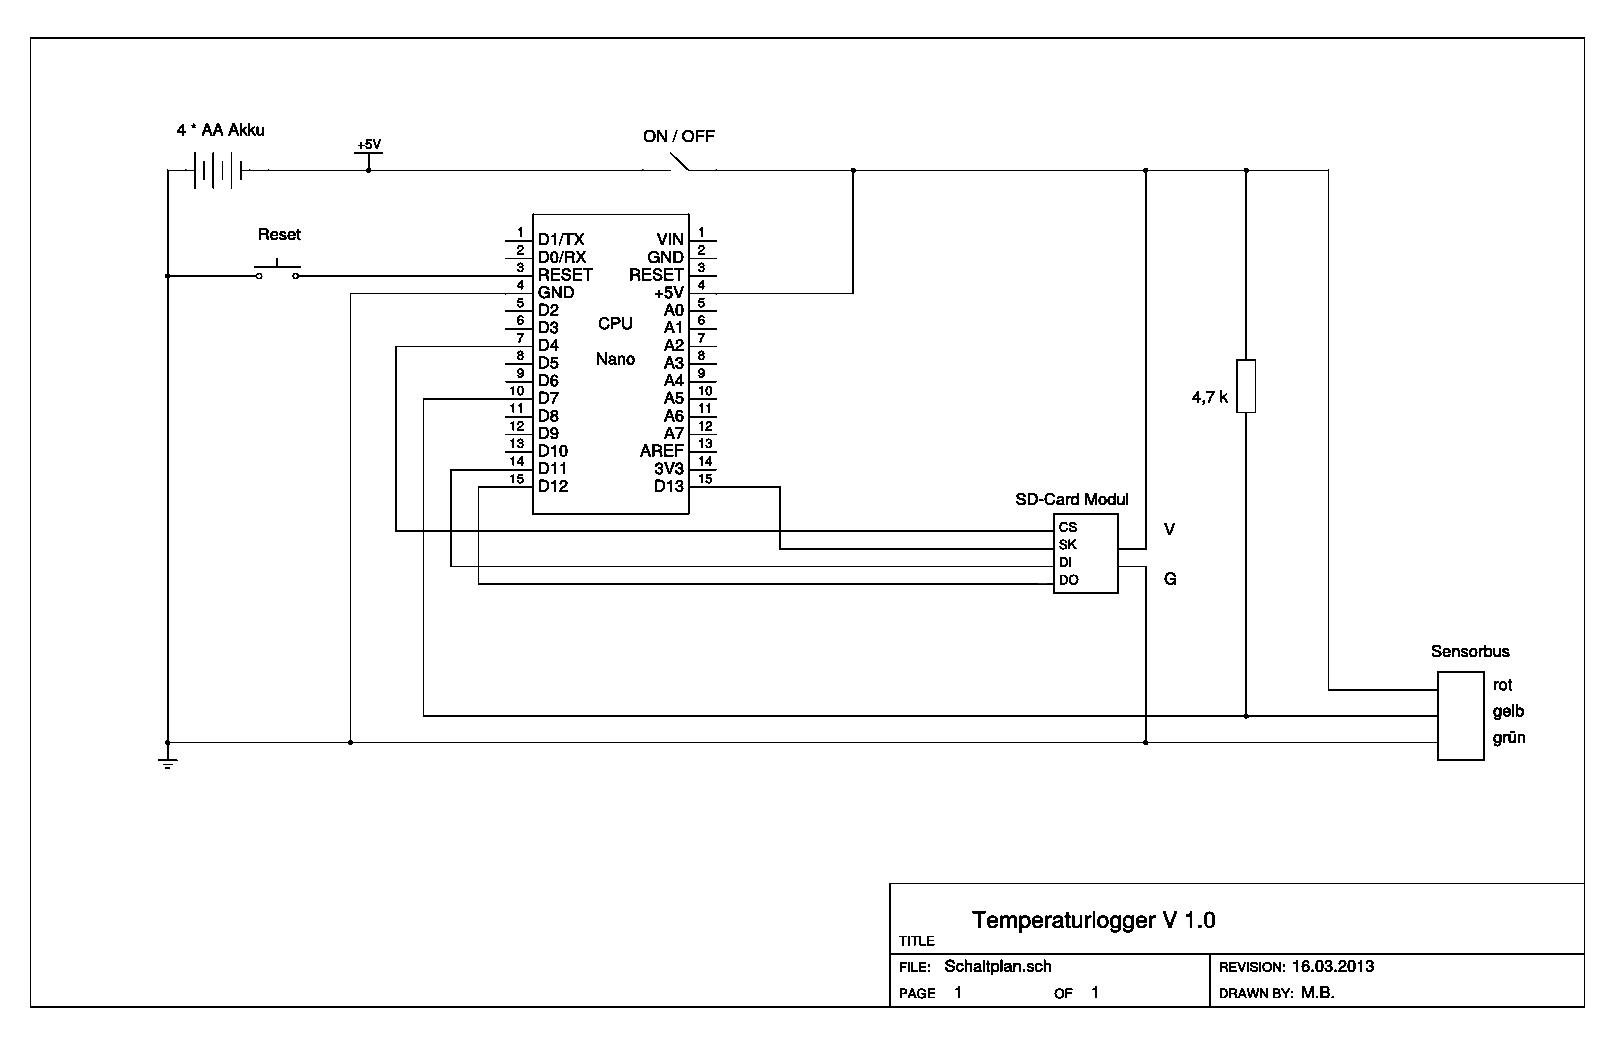 arduino projekt temperaturlogger. Black Bedroom Furniture Sets. Home Design Ideas